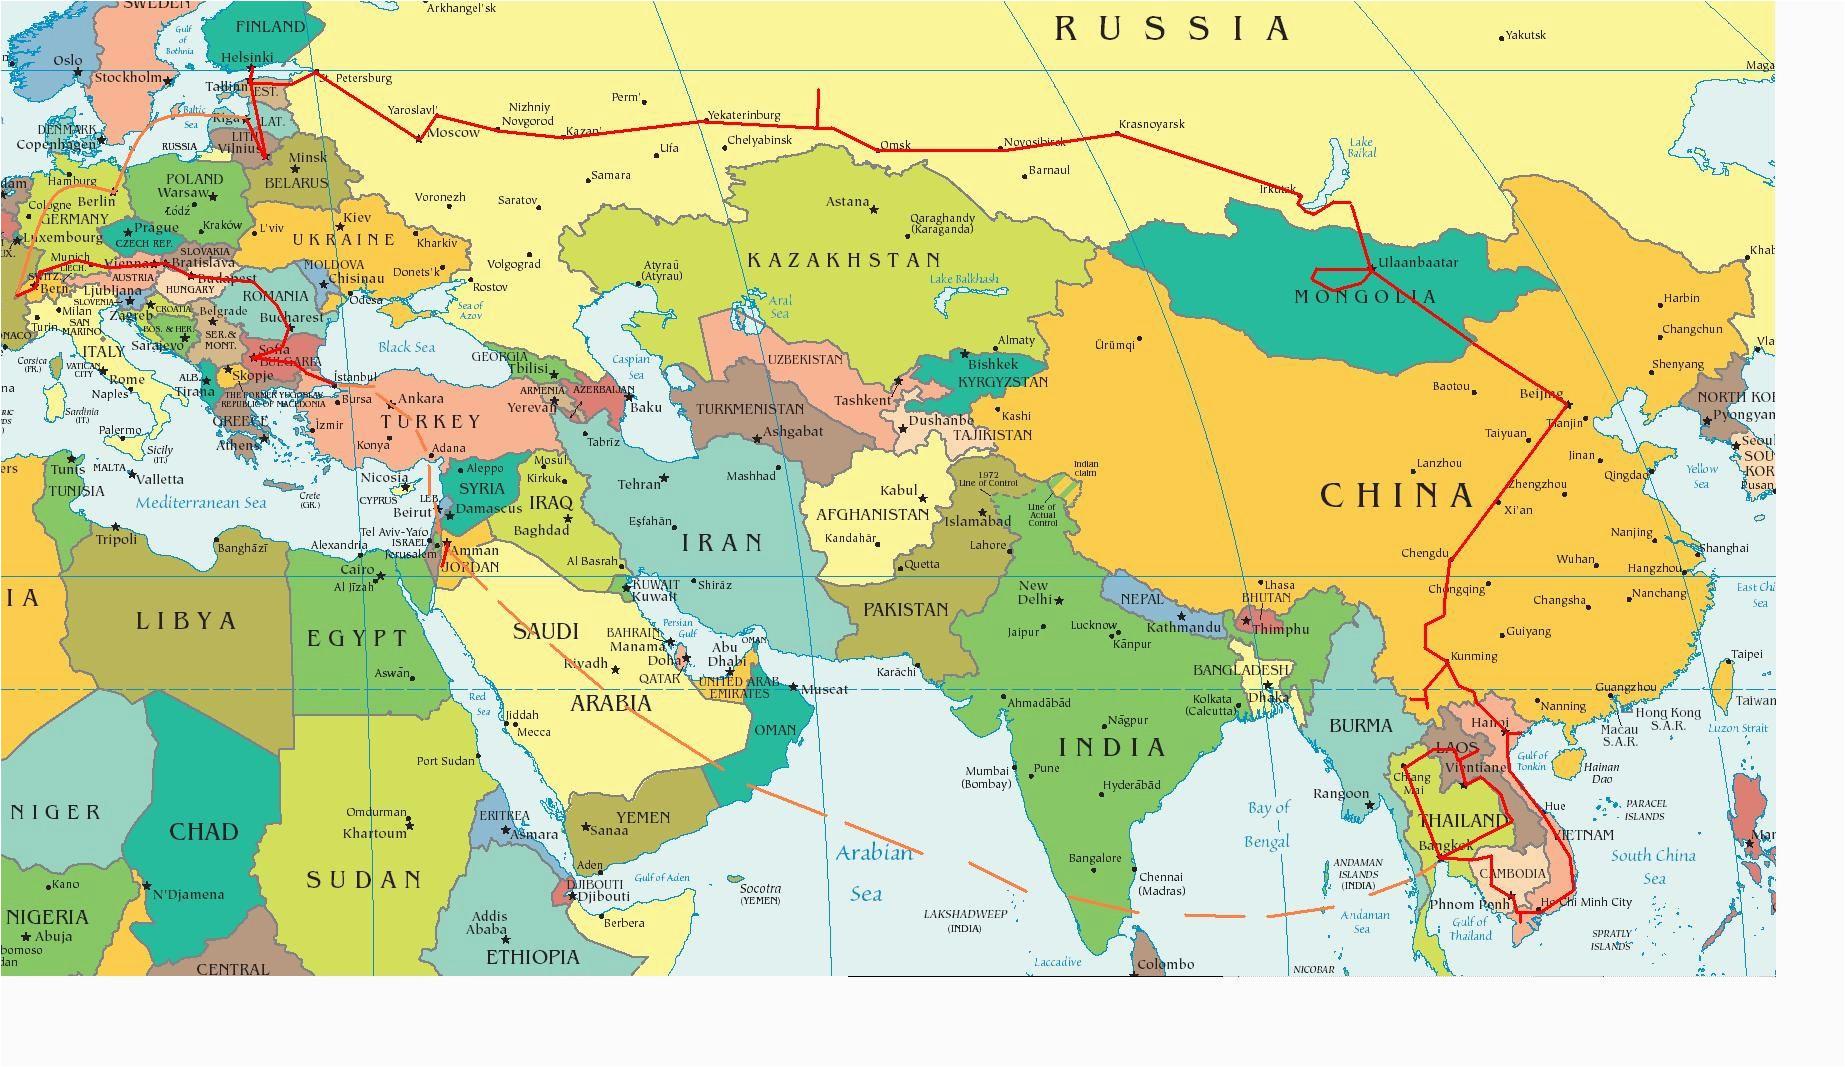 Physical Map Of Eastern Europe Eastern Europe and Middle East Partial Europe Middle East